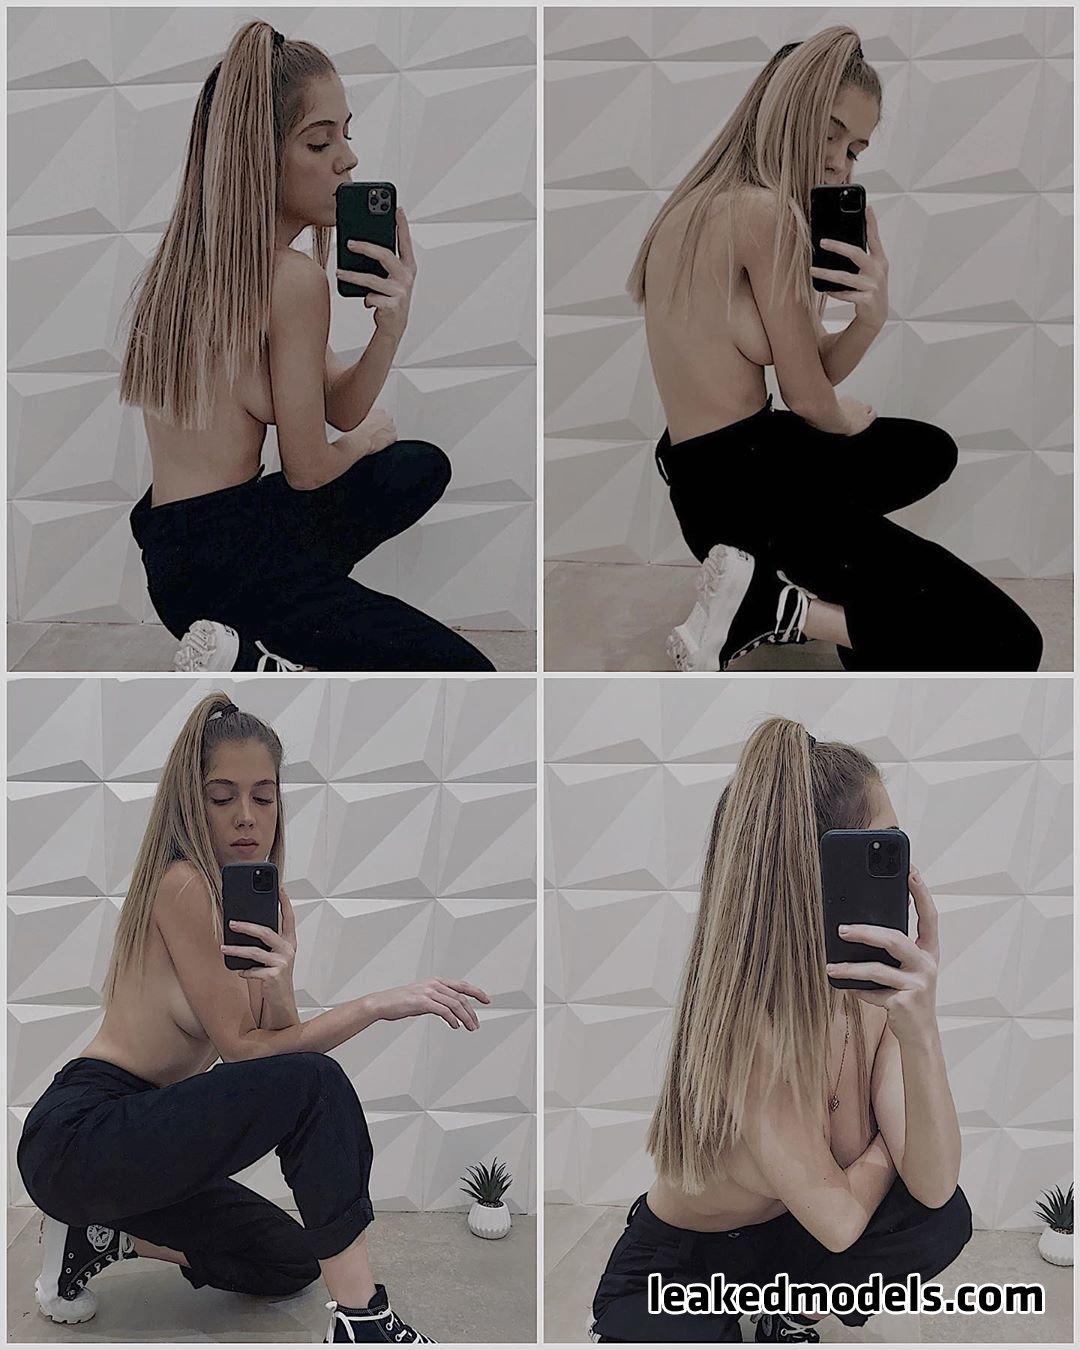 Linor Shlomovitz Instagram Sexy Leaks (10 Photos)